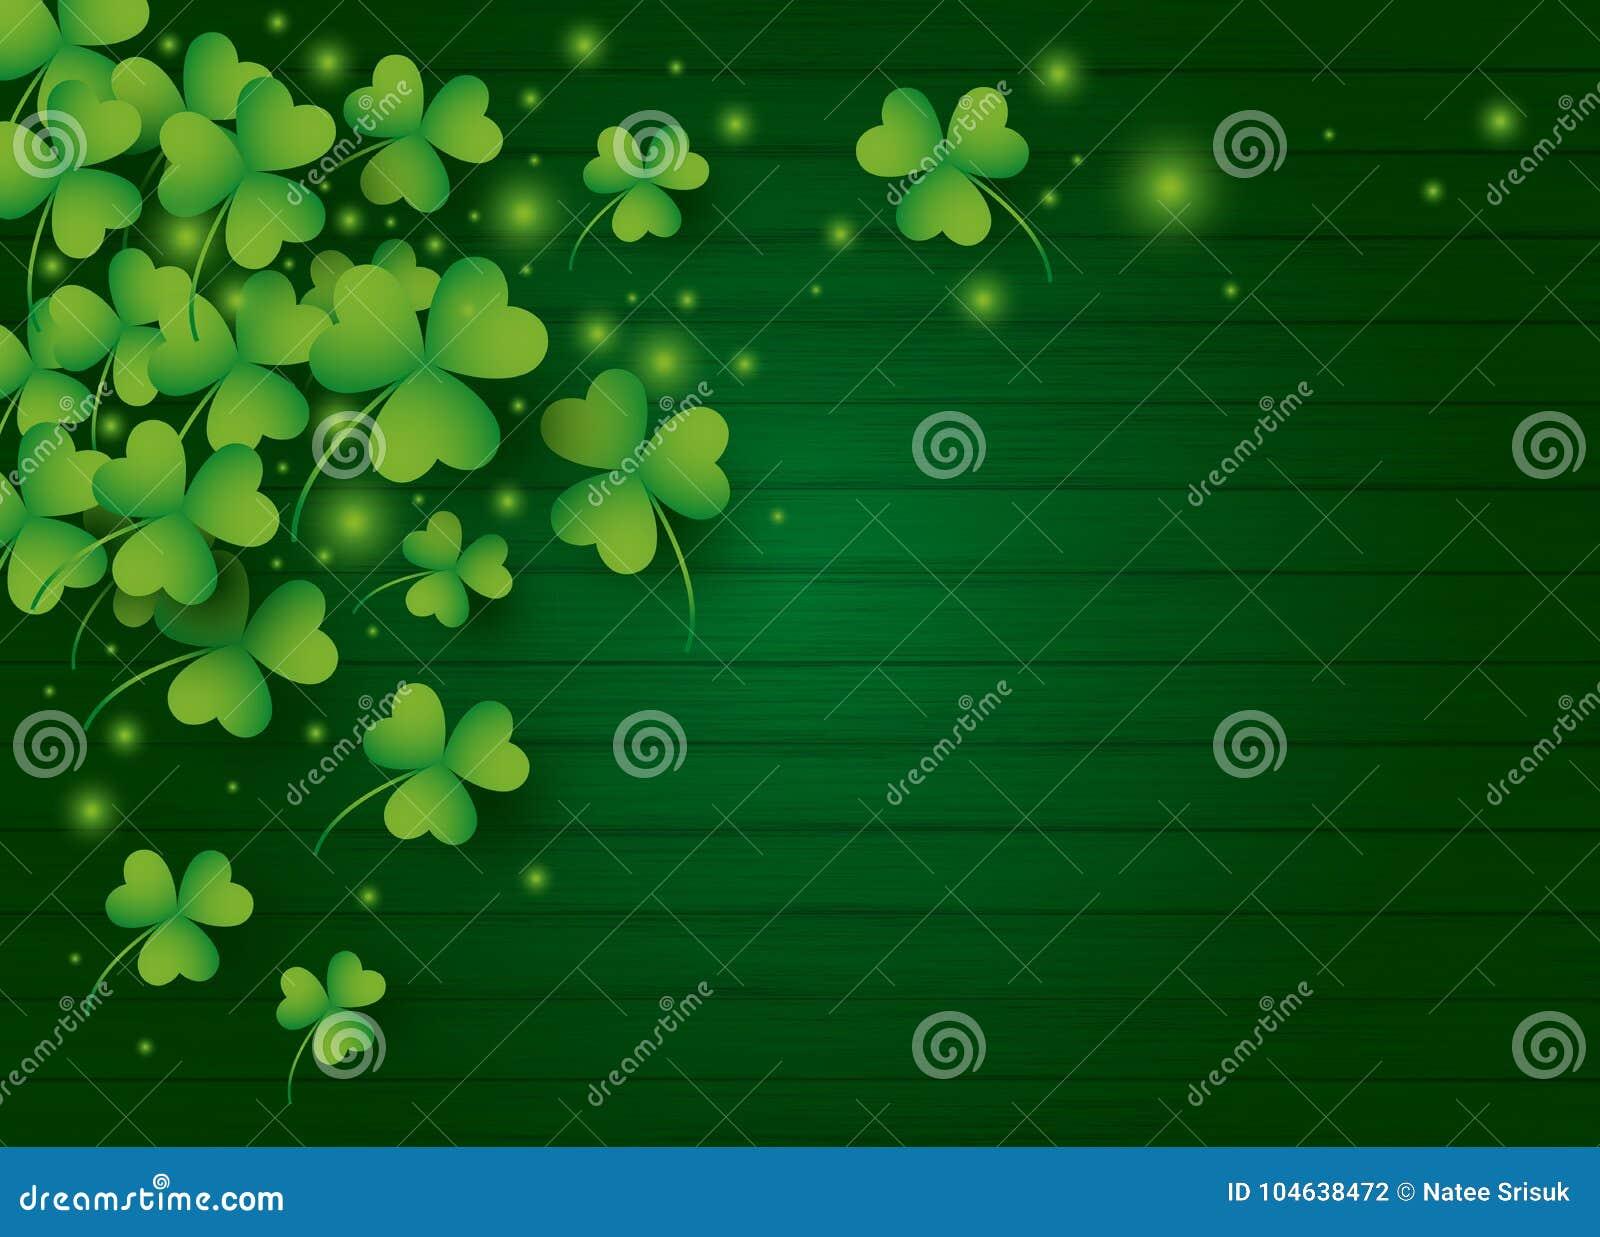 St Patricks day background design of clover leaves